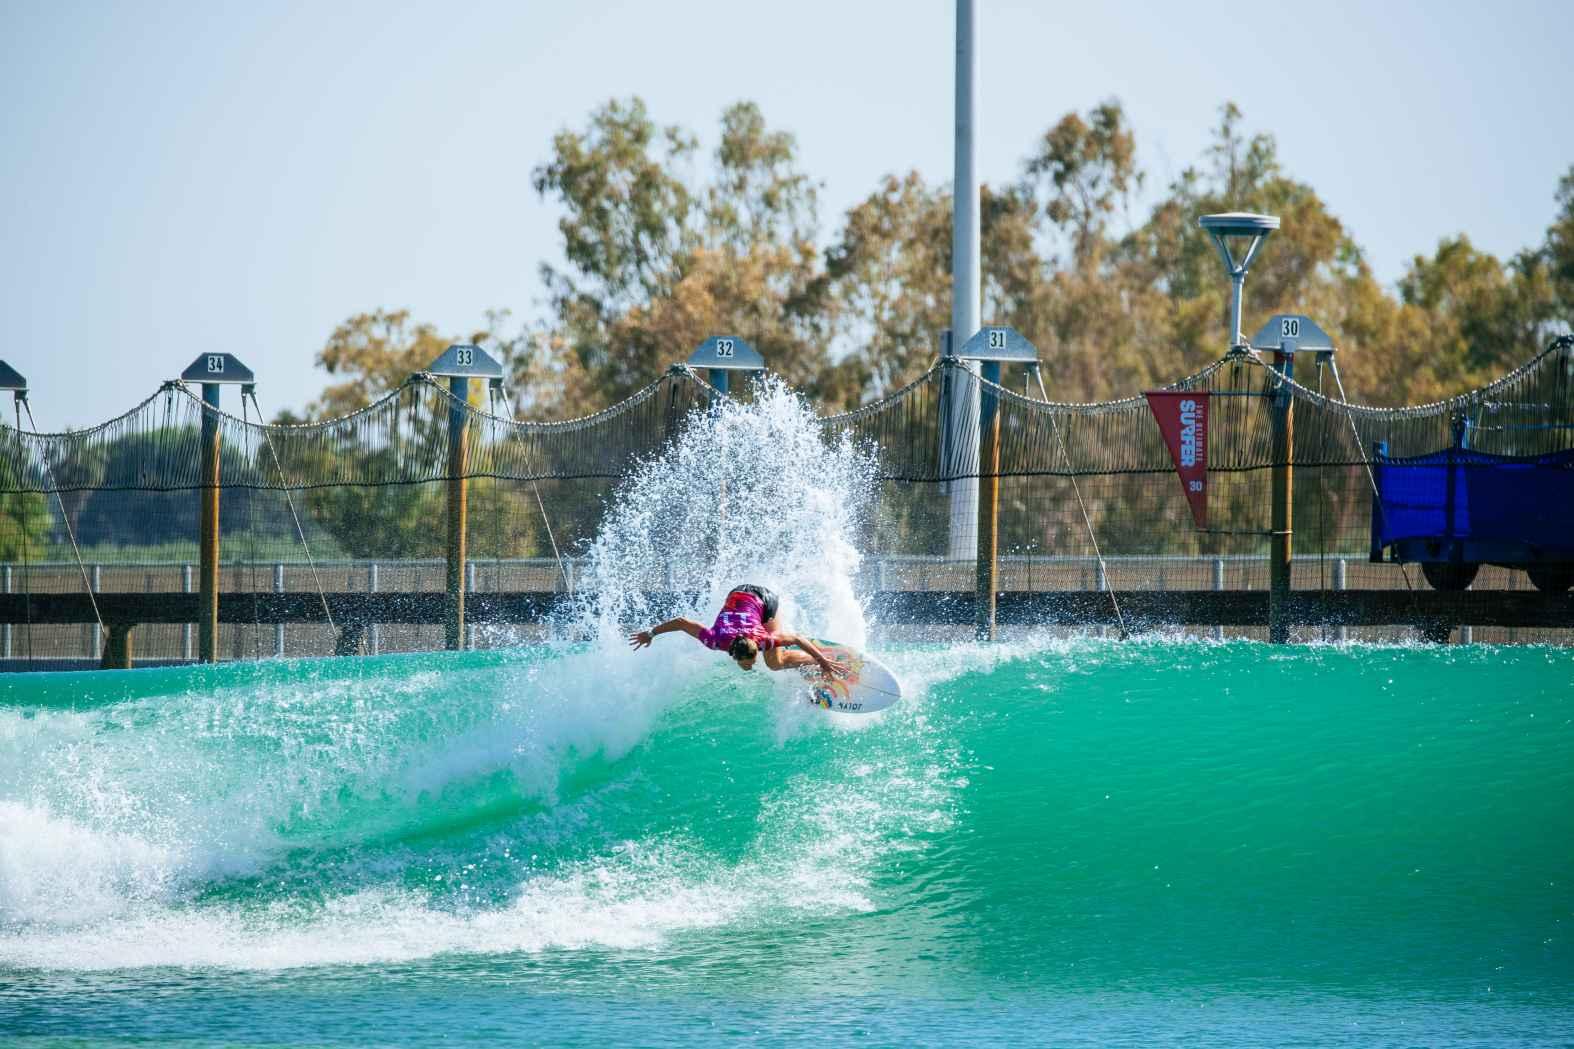 surf30 surf ranch pro 2021 wsl surf Conlogue C Ranch21 Heff 5921